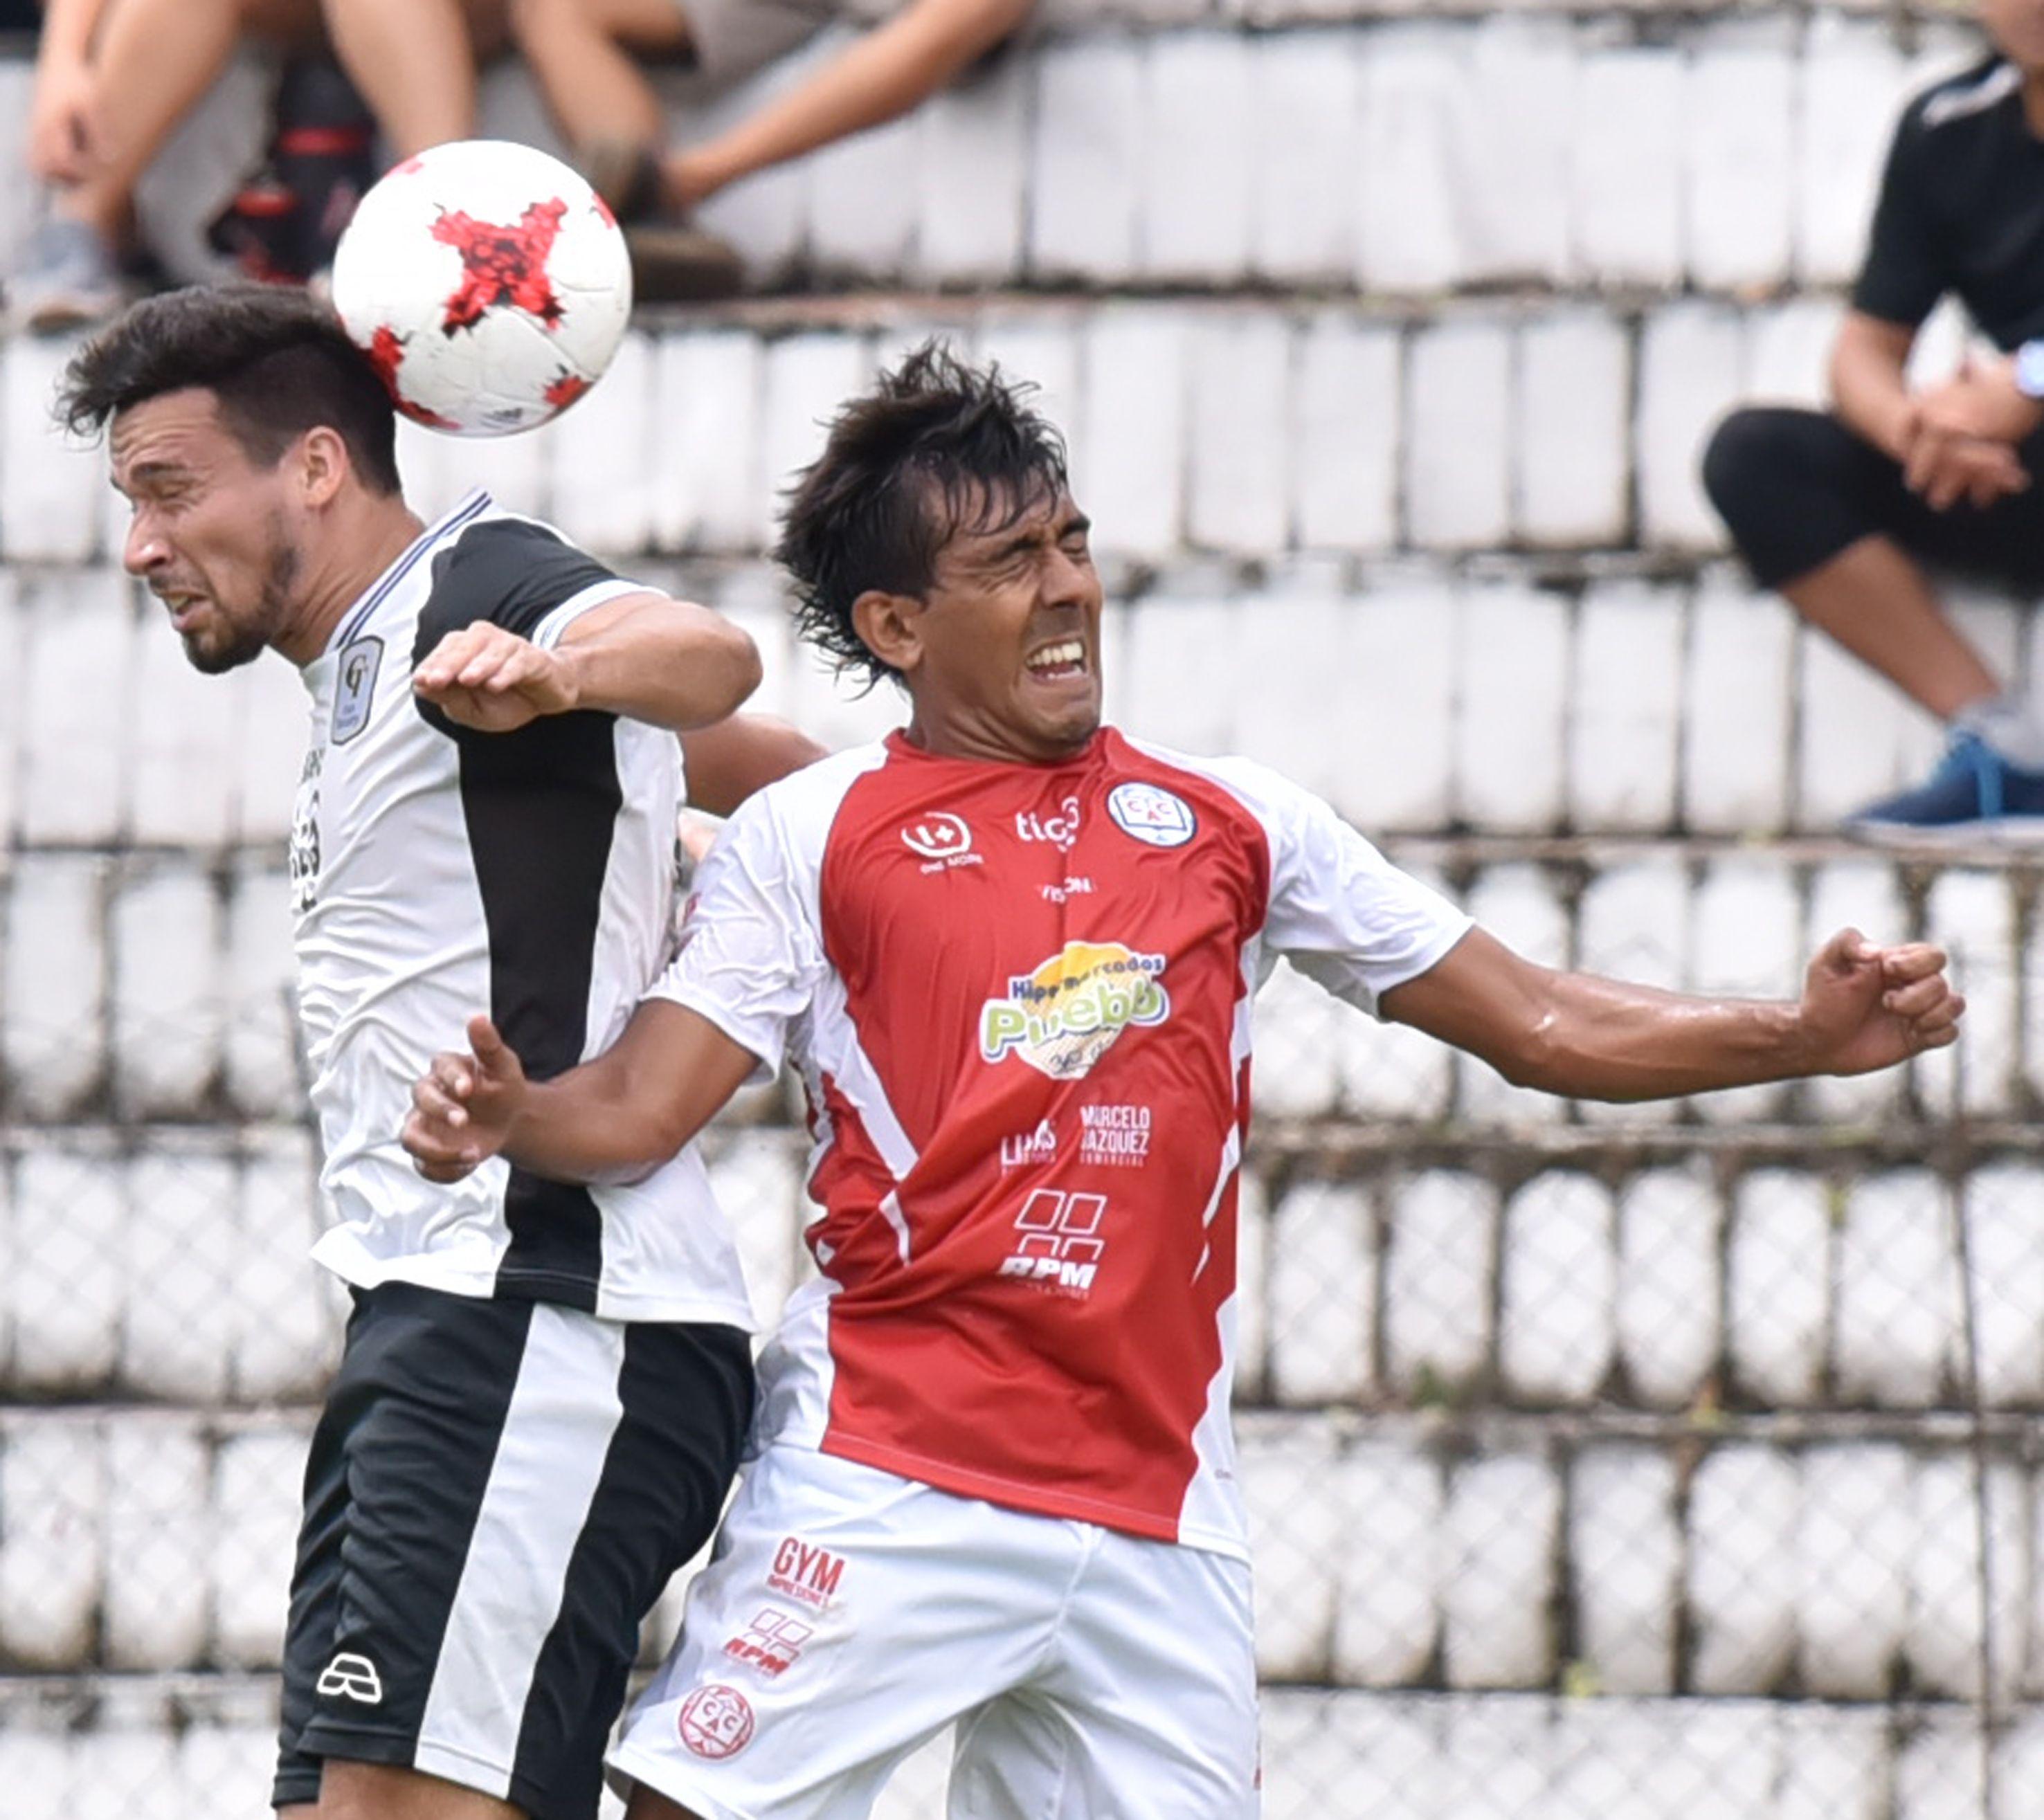 Colegiales salta a escena en la Copa Paraguay. Foto: Última Hora.